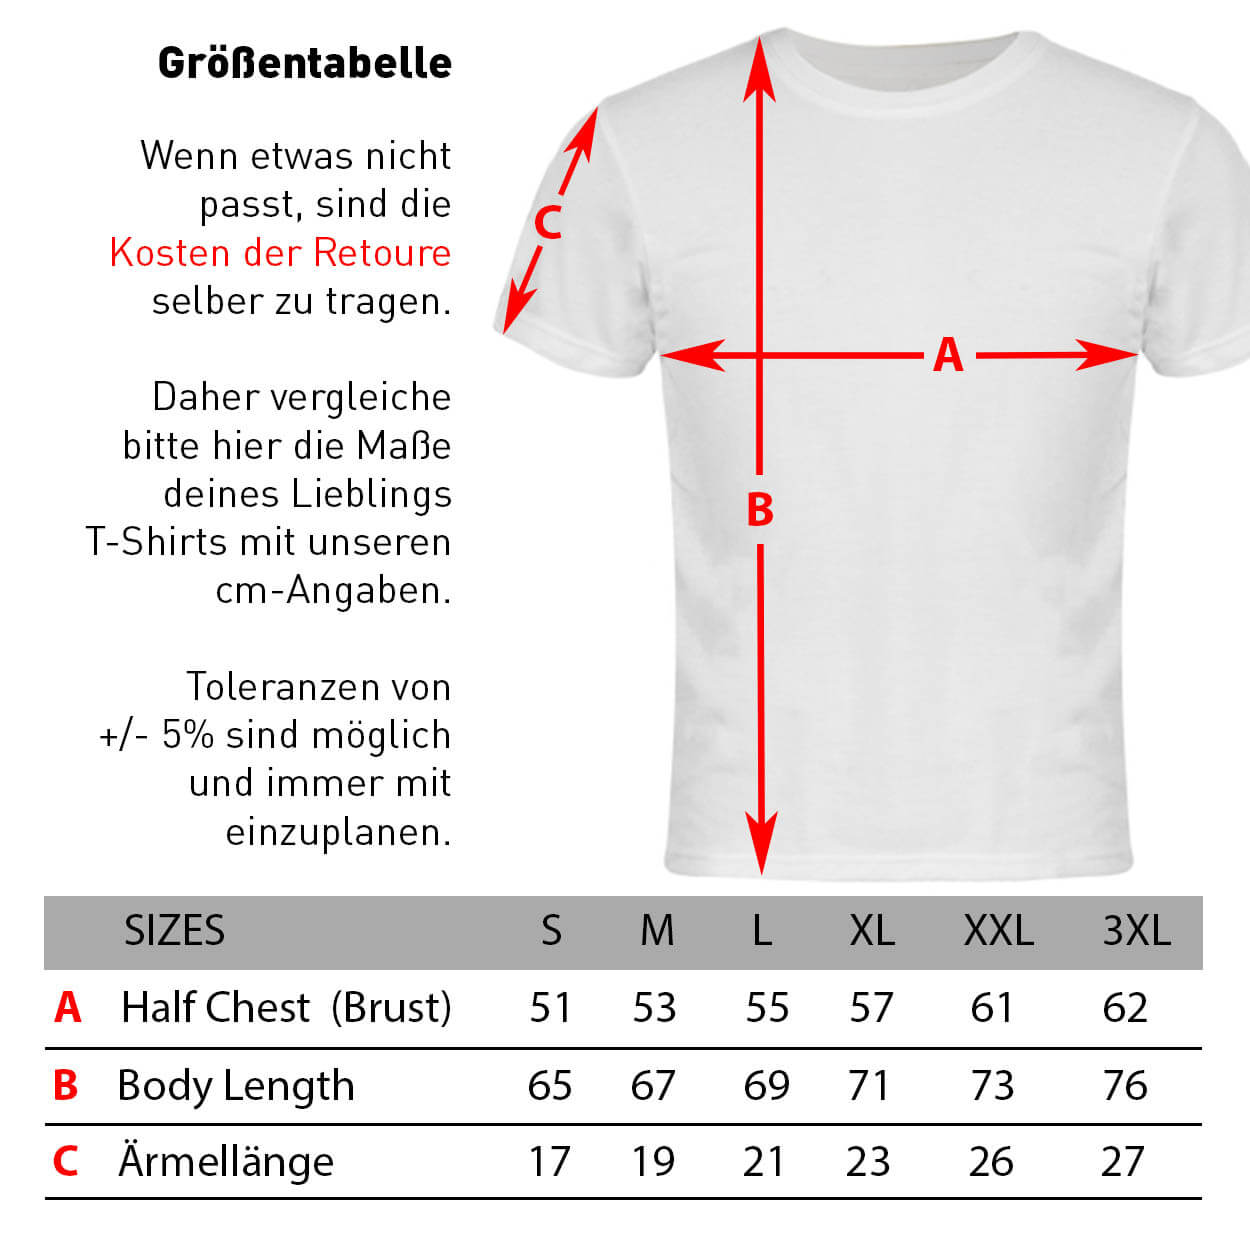 EINSATZKRAFT® Fitness Feuerwehr Funktions-Shirt Männer